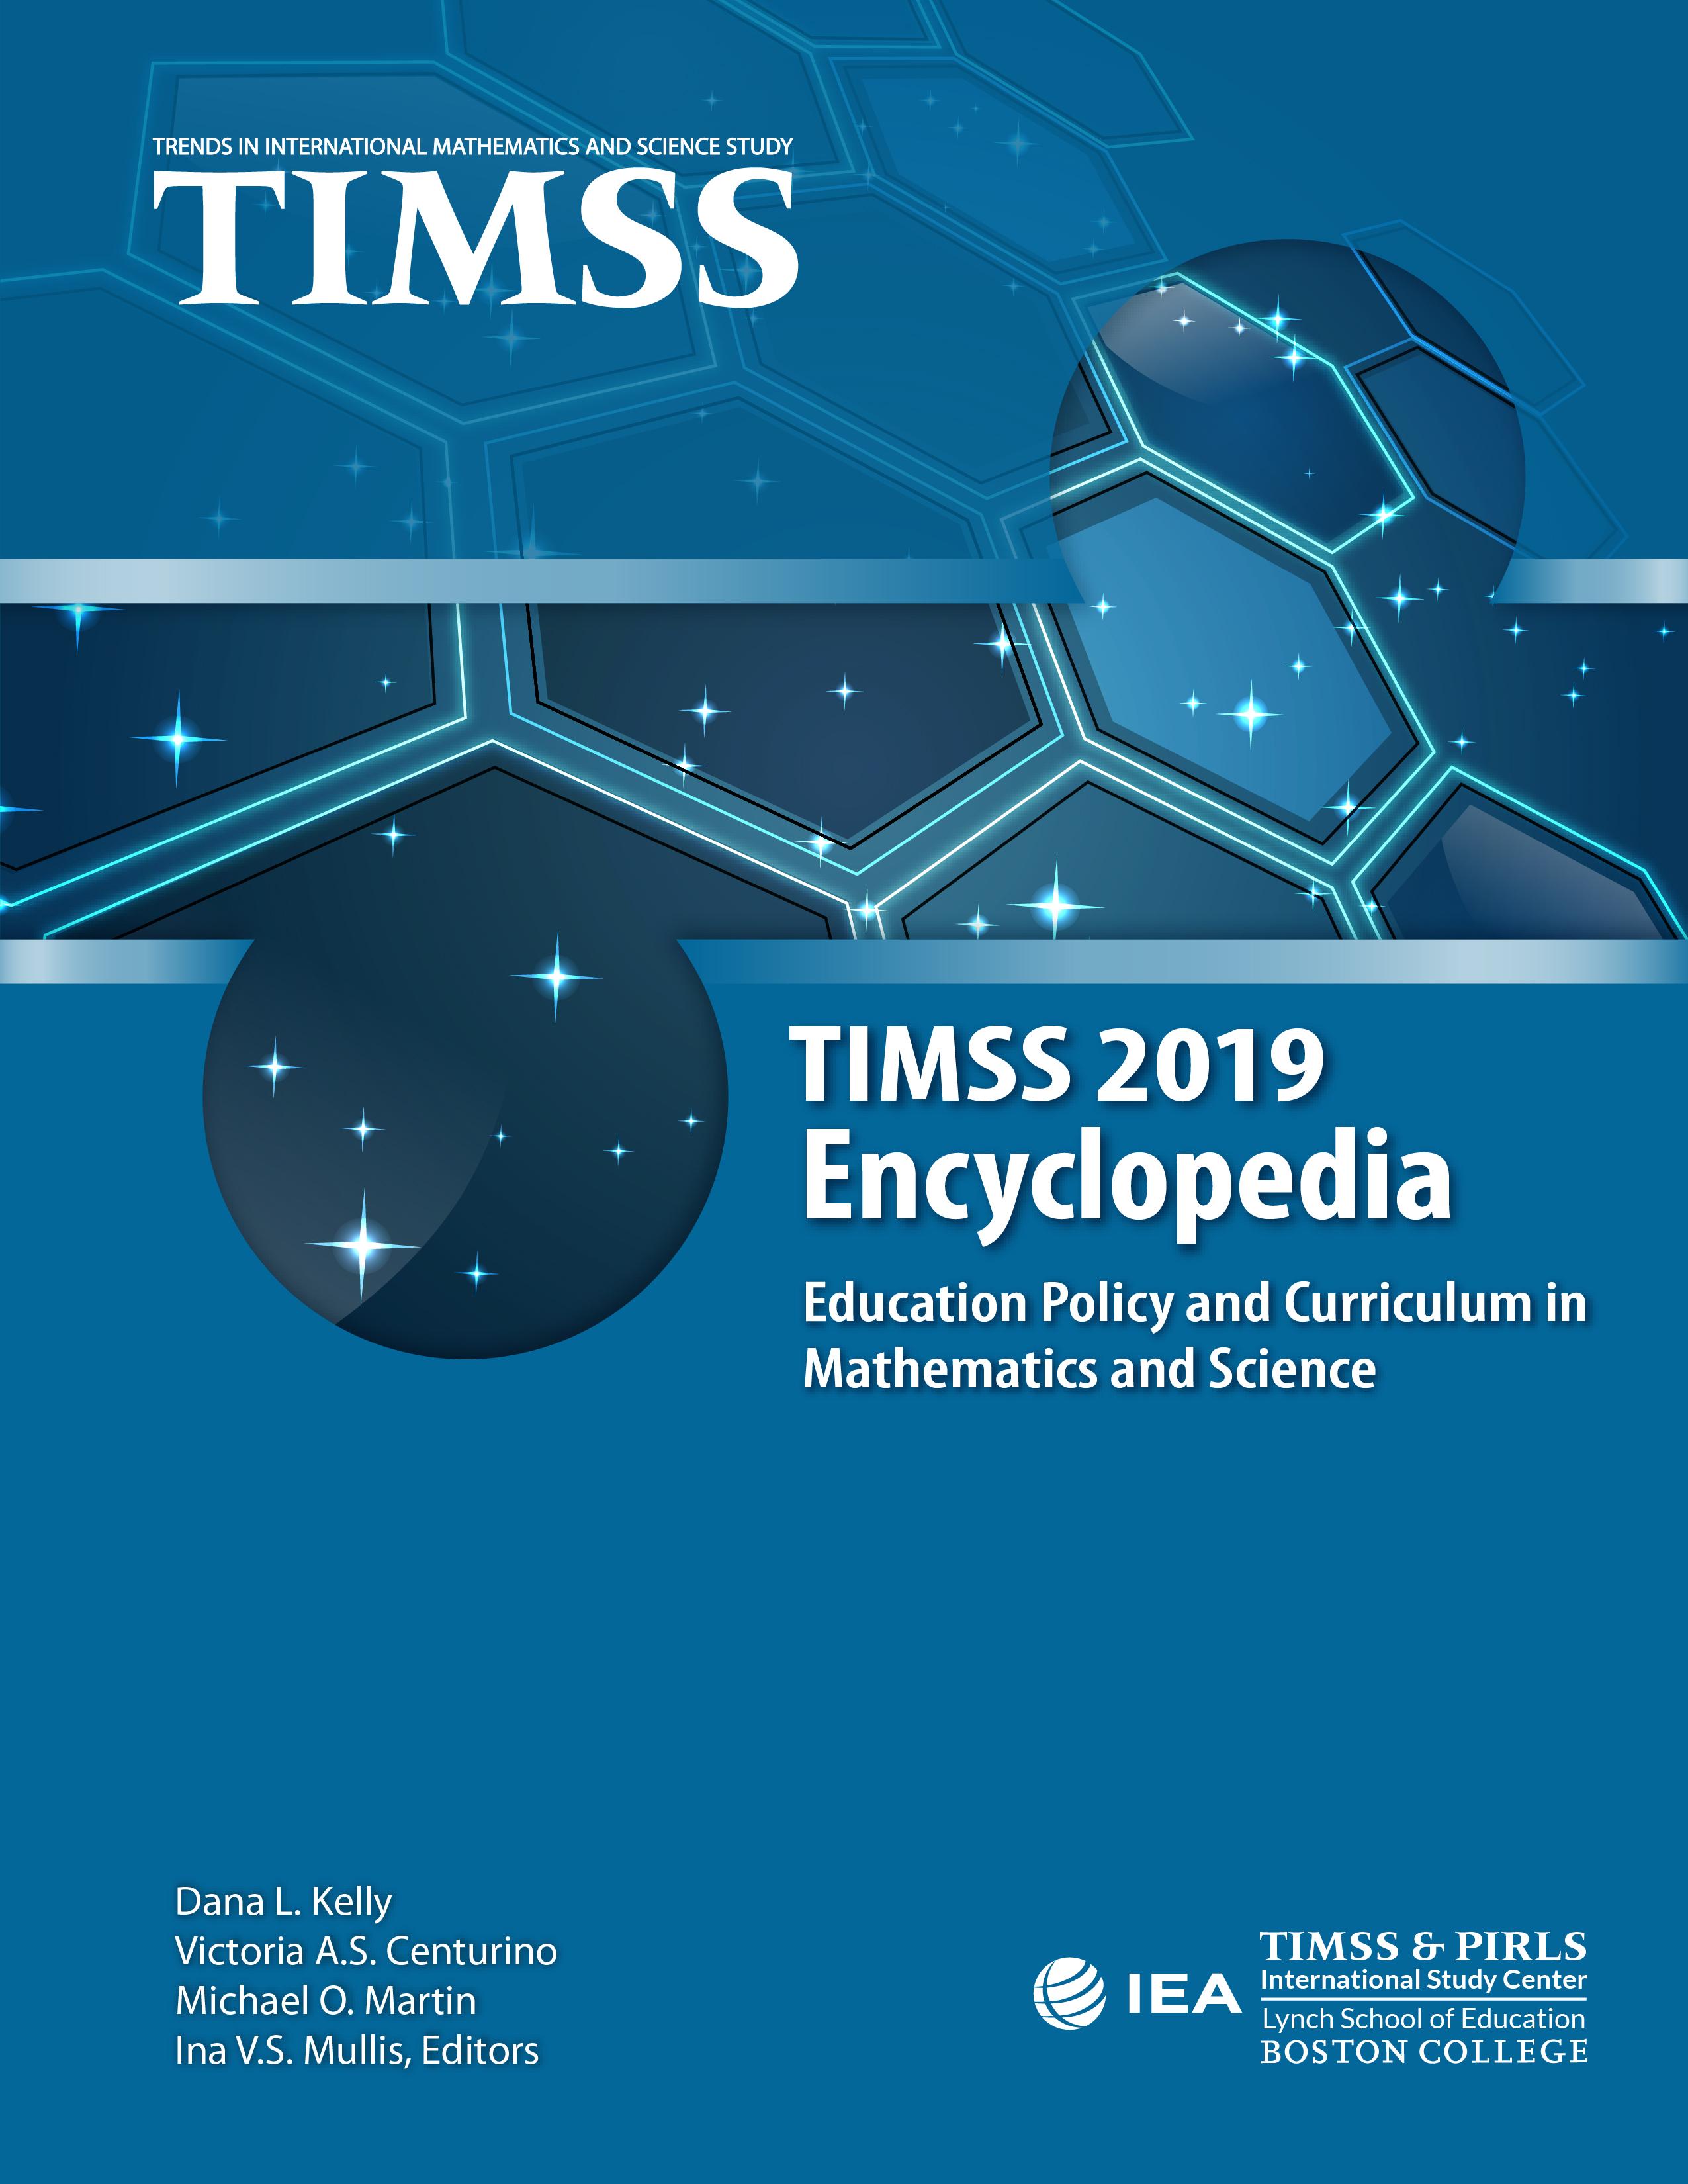 TIMSS 2019 Encyclopedia